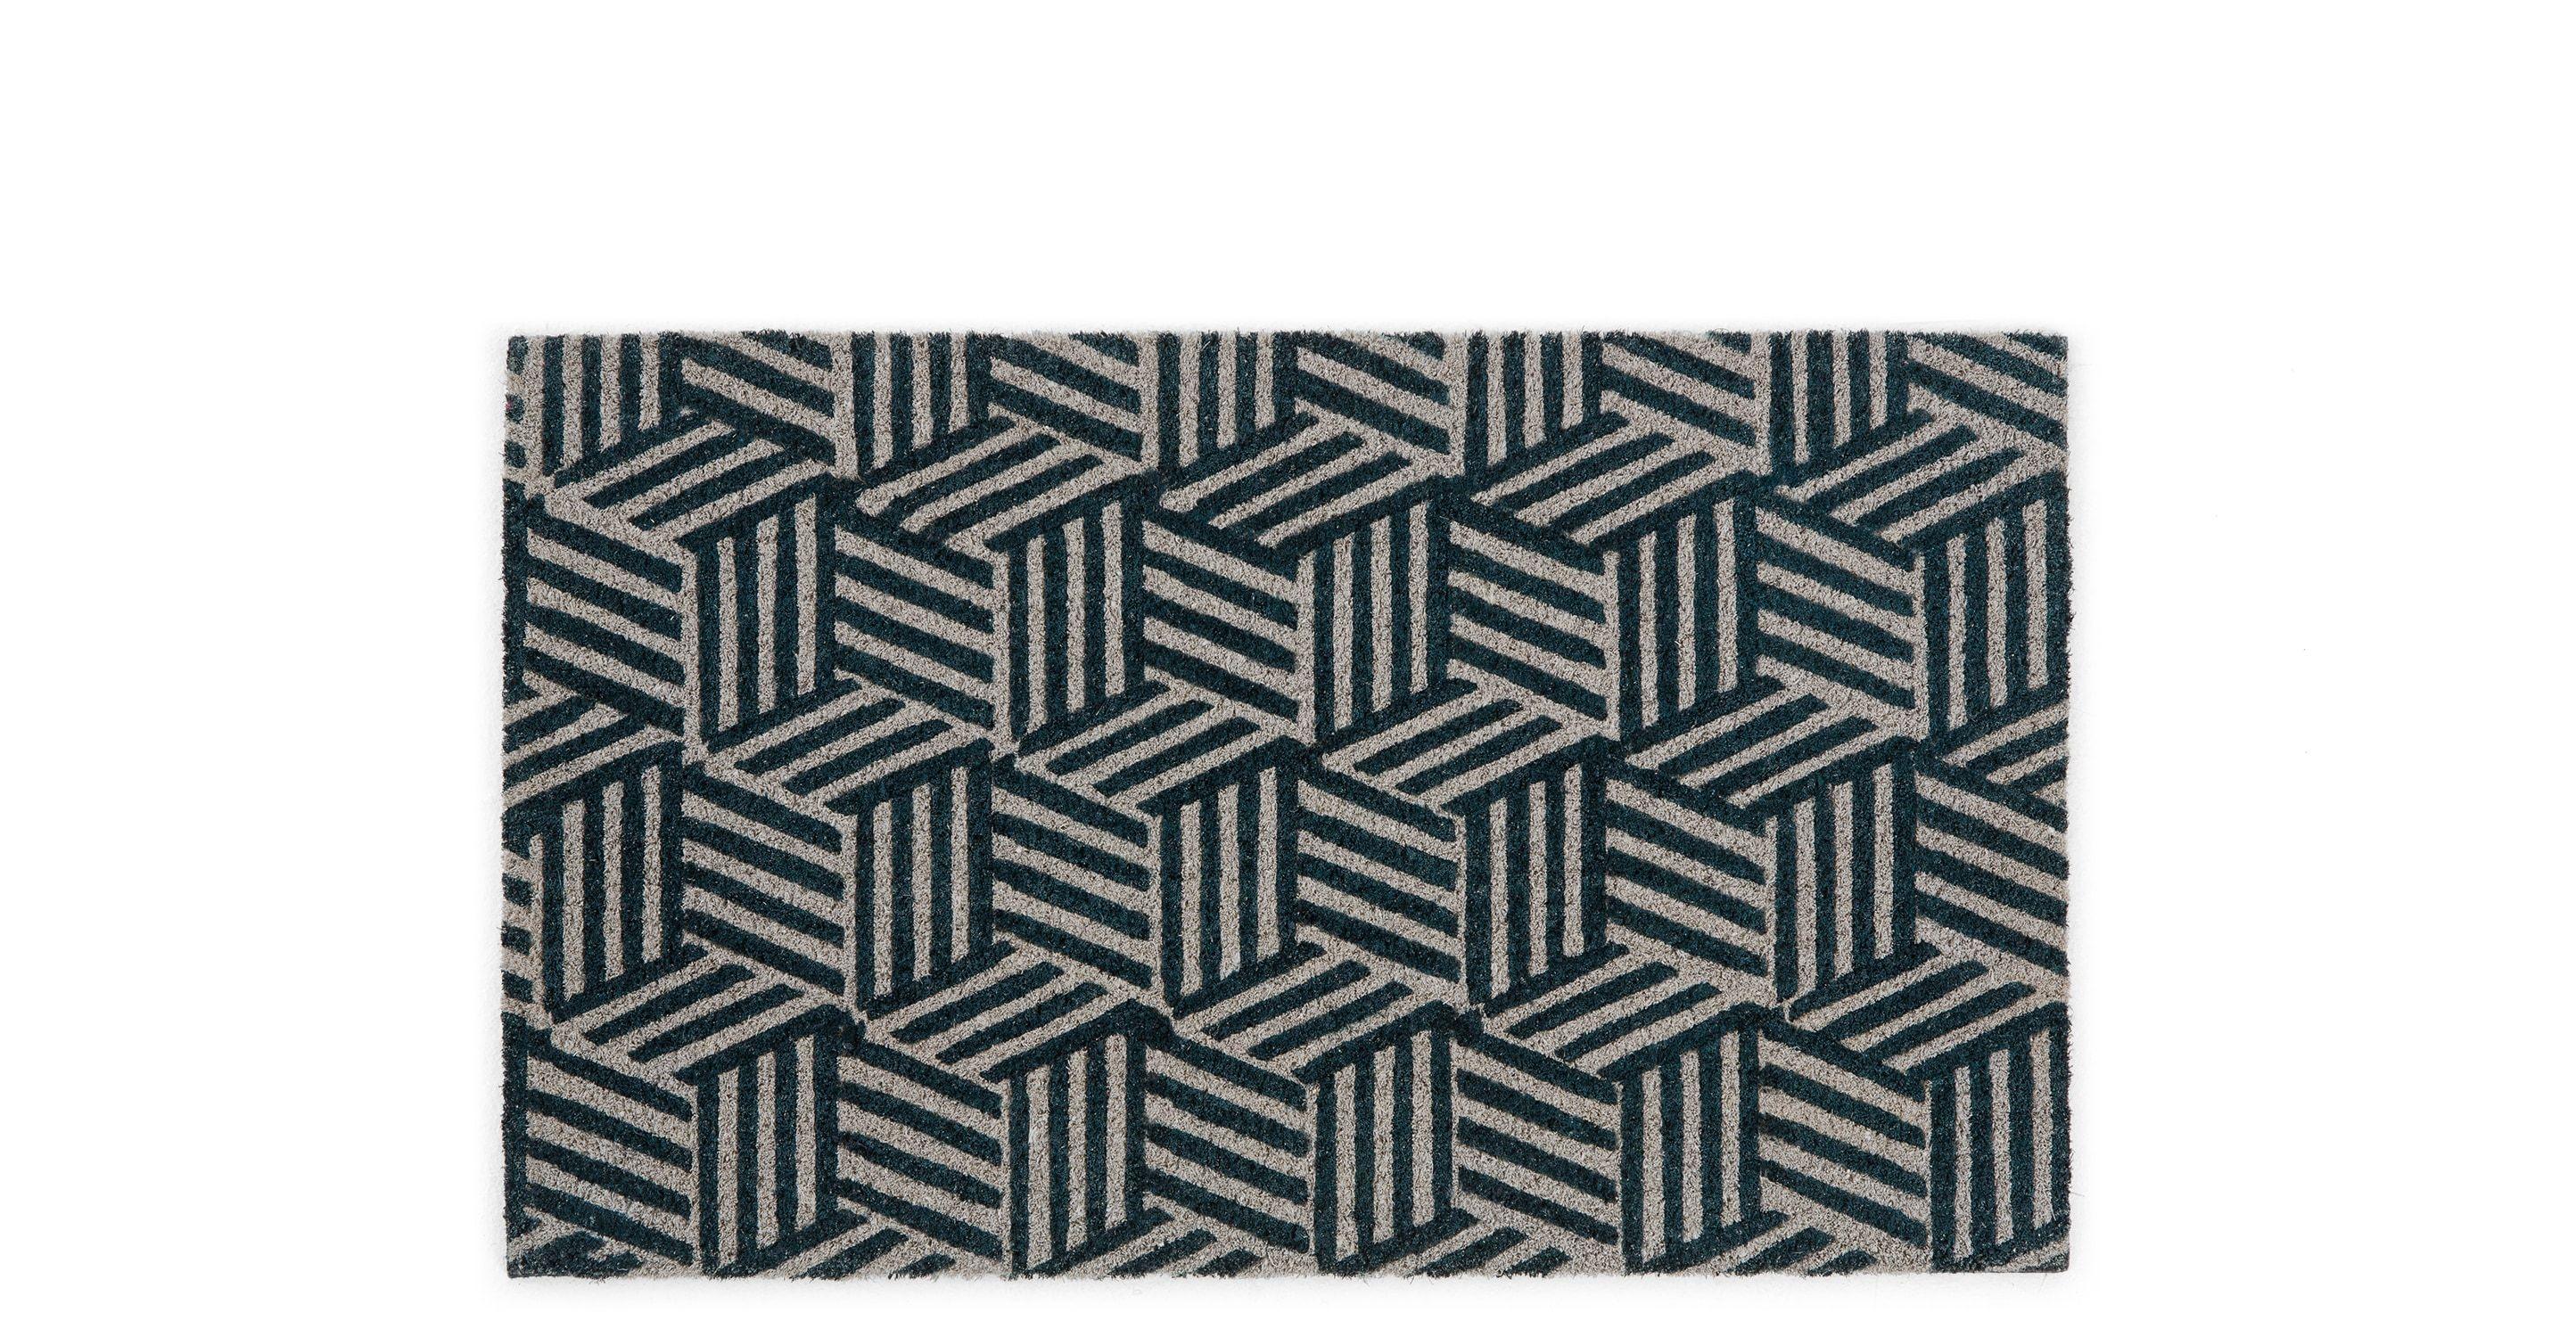 #super  -->  Fußmatten -  Cubus Fußmatte (45 x 75 cm), Marineblau - MADE.com -   // check out more -->  MADE.com